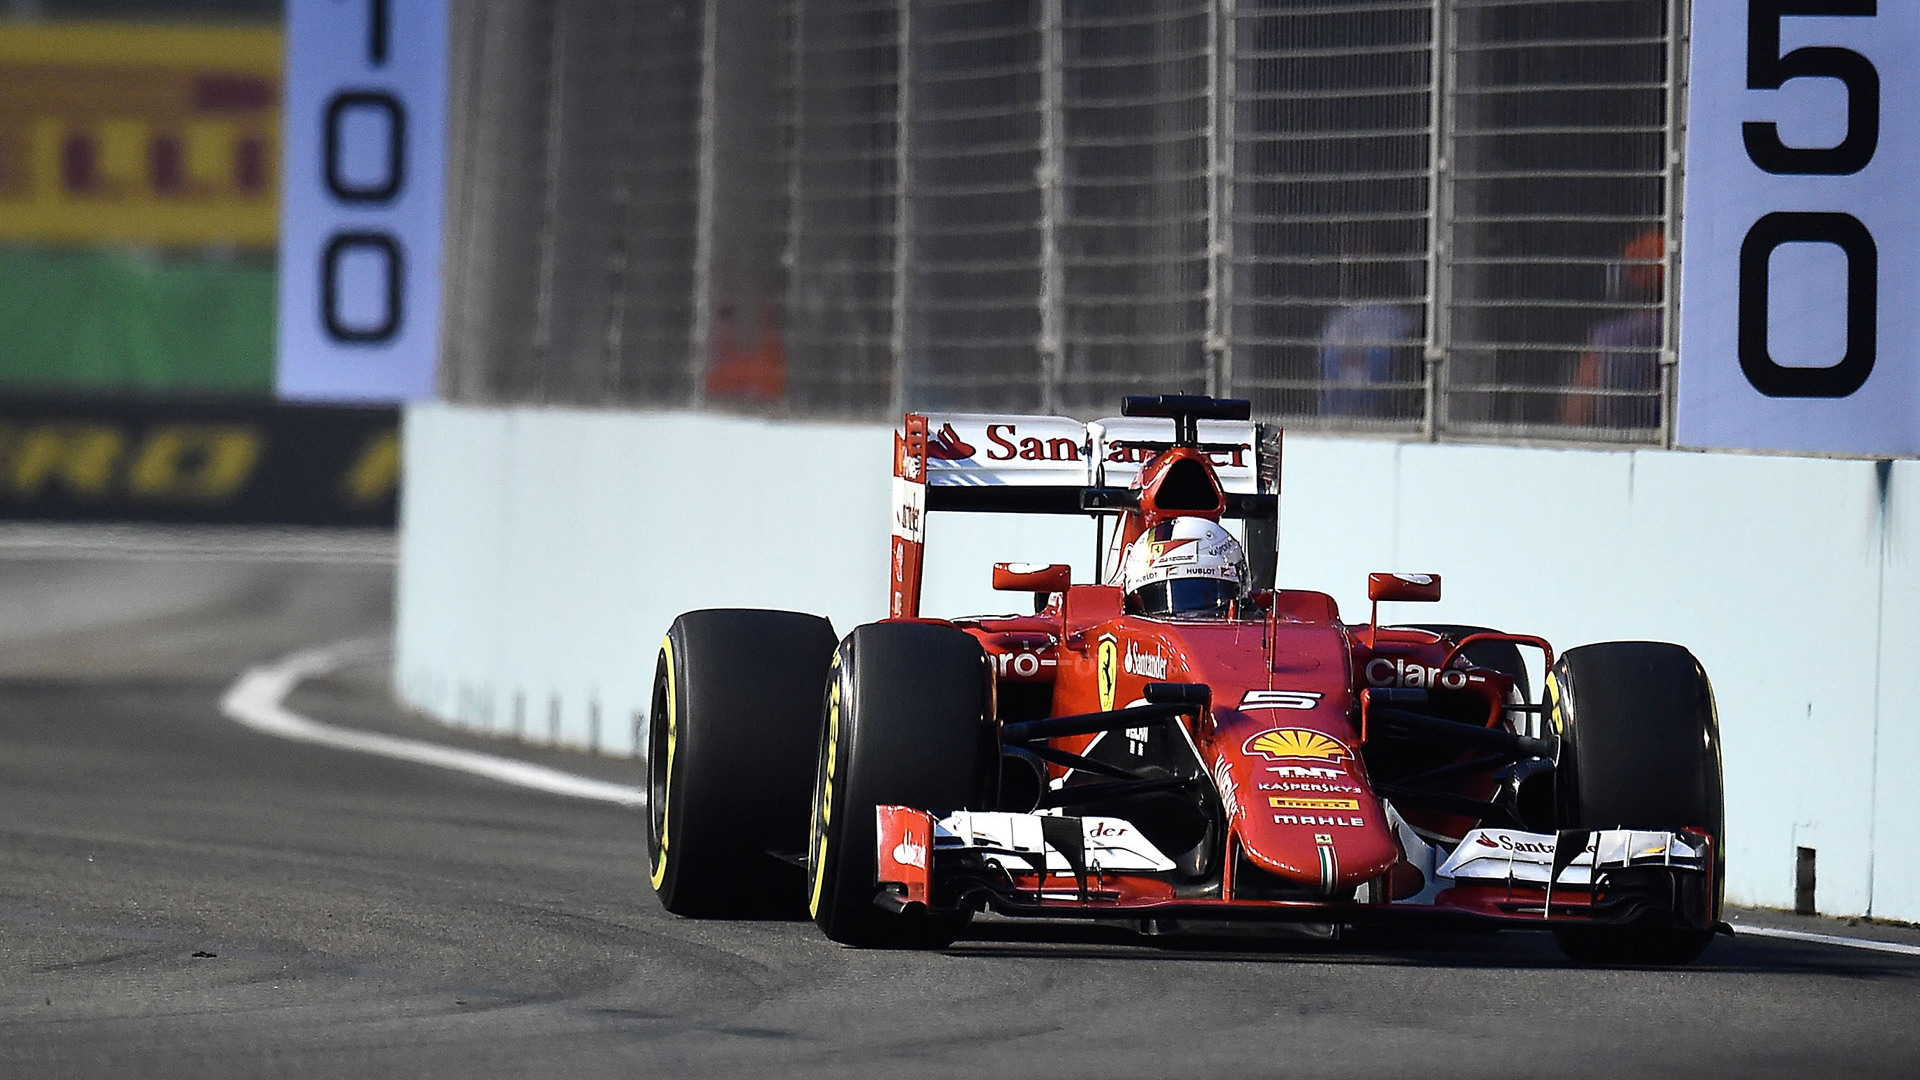 Ferrari's Sebastian Vettel at the 2015 Formula One Singapore Grand Prix